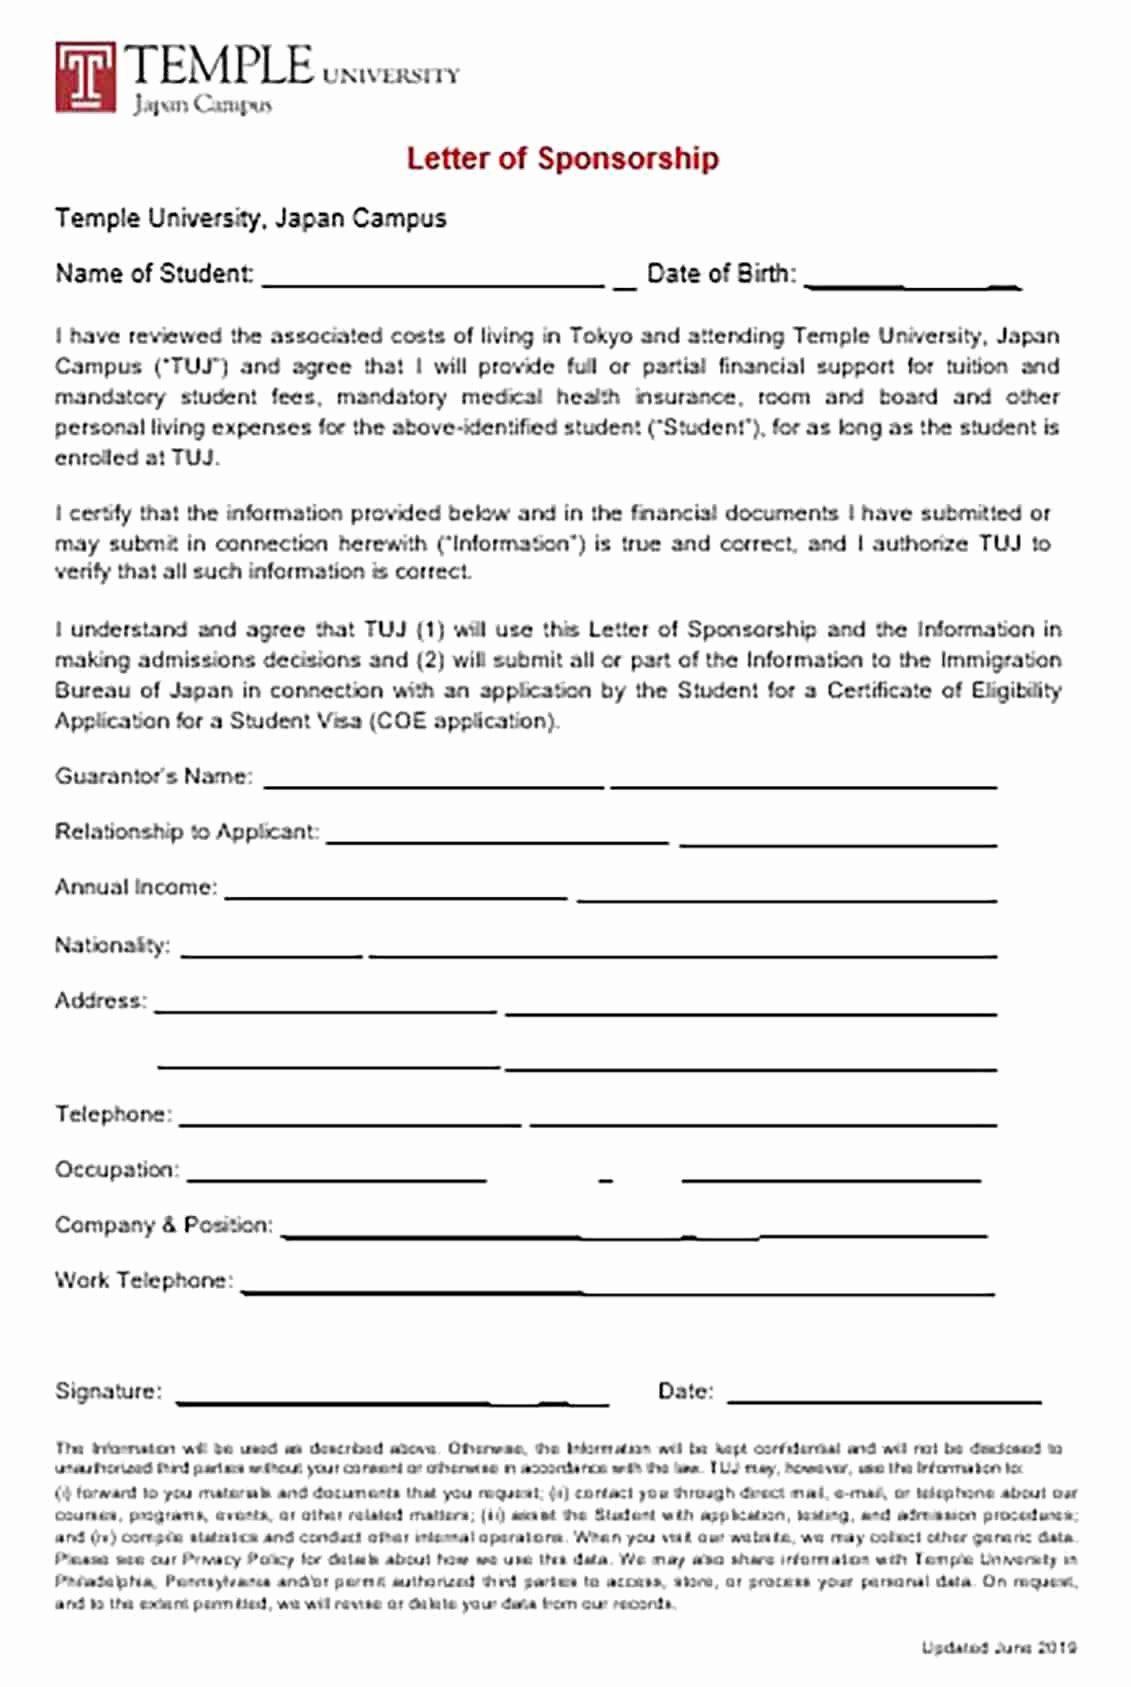 Sponsor Letter For Student New Visa Sponsorship Letter And Tips To Make The Reader Interested In In 2020 Lettering Sponsorship Letter Printable Letter Templates